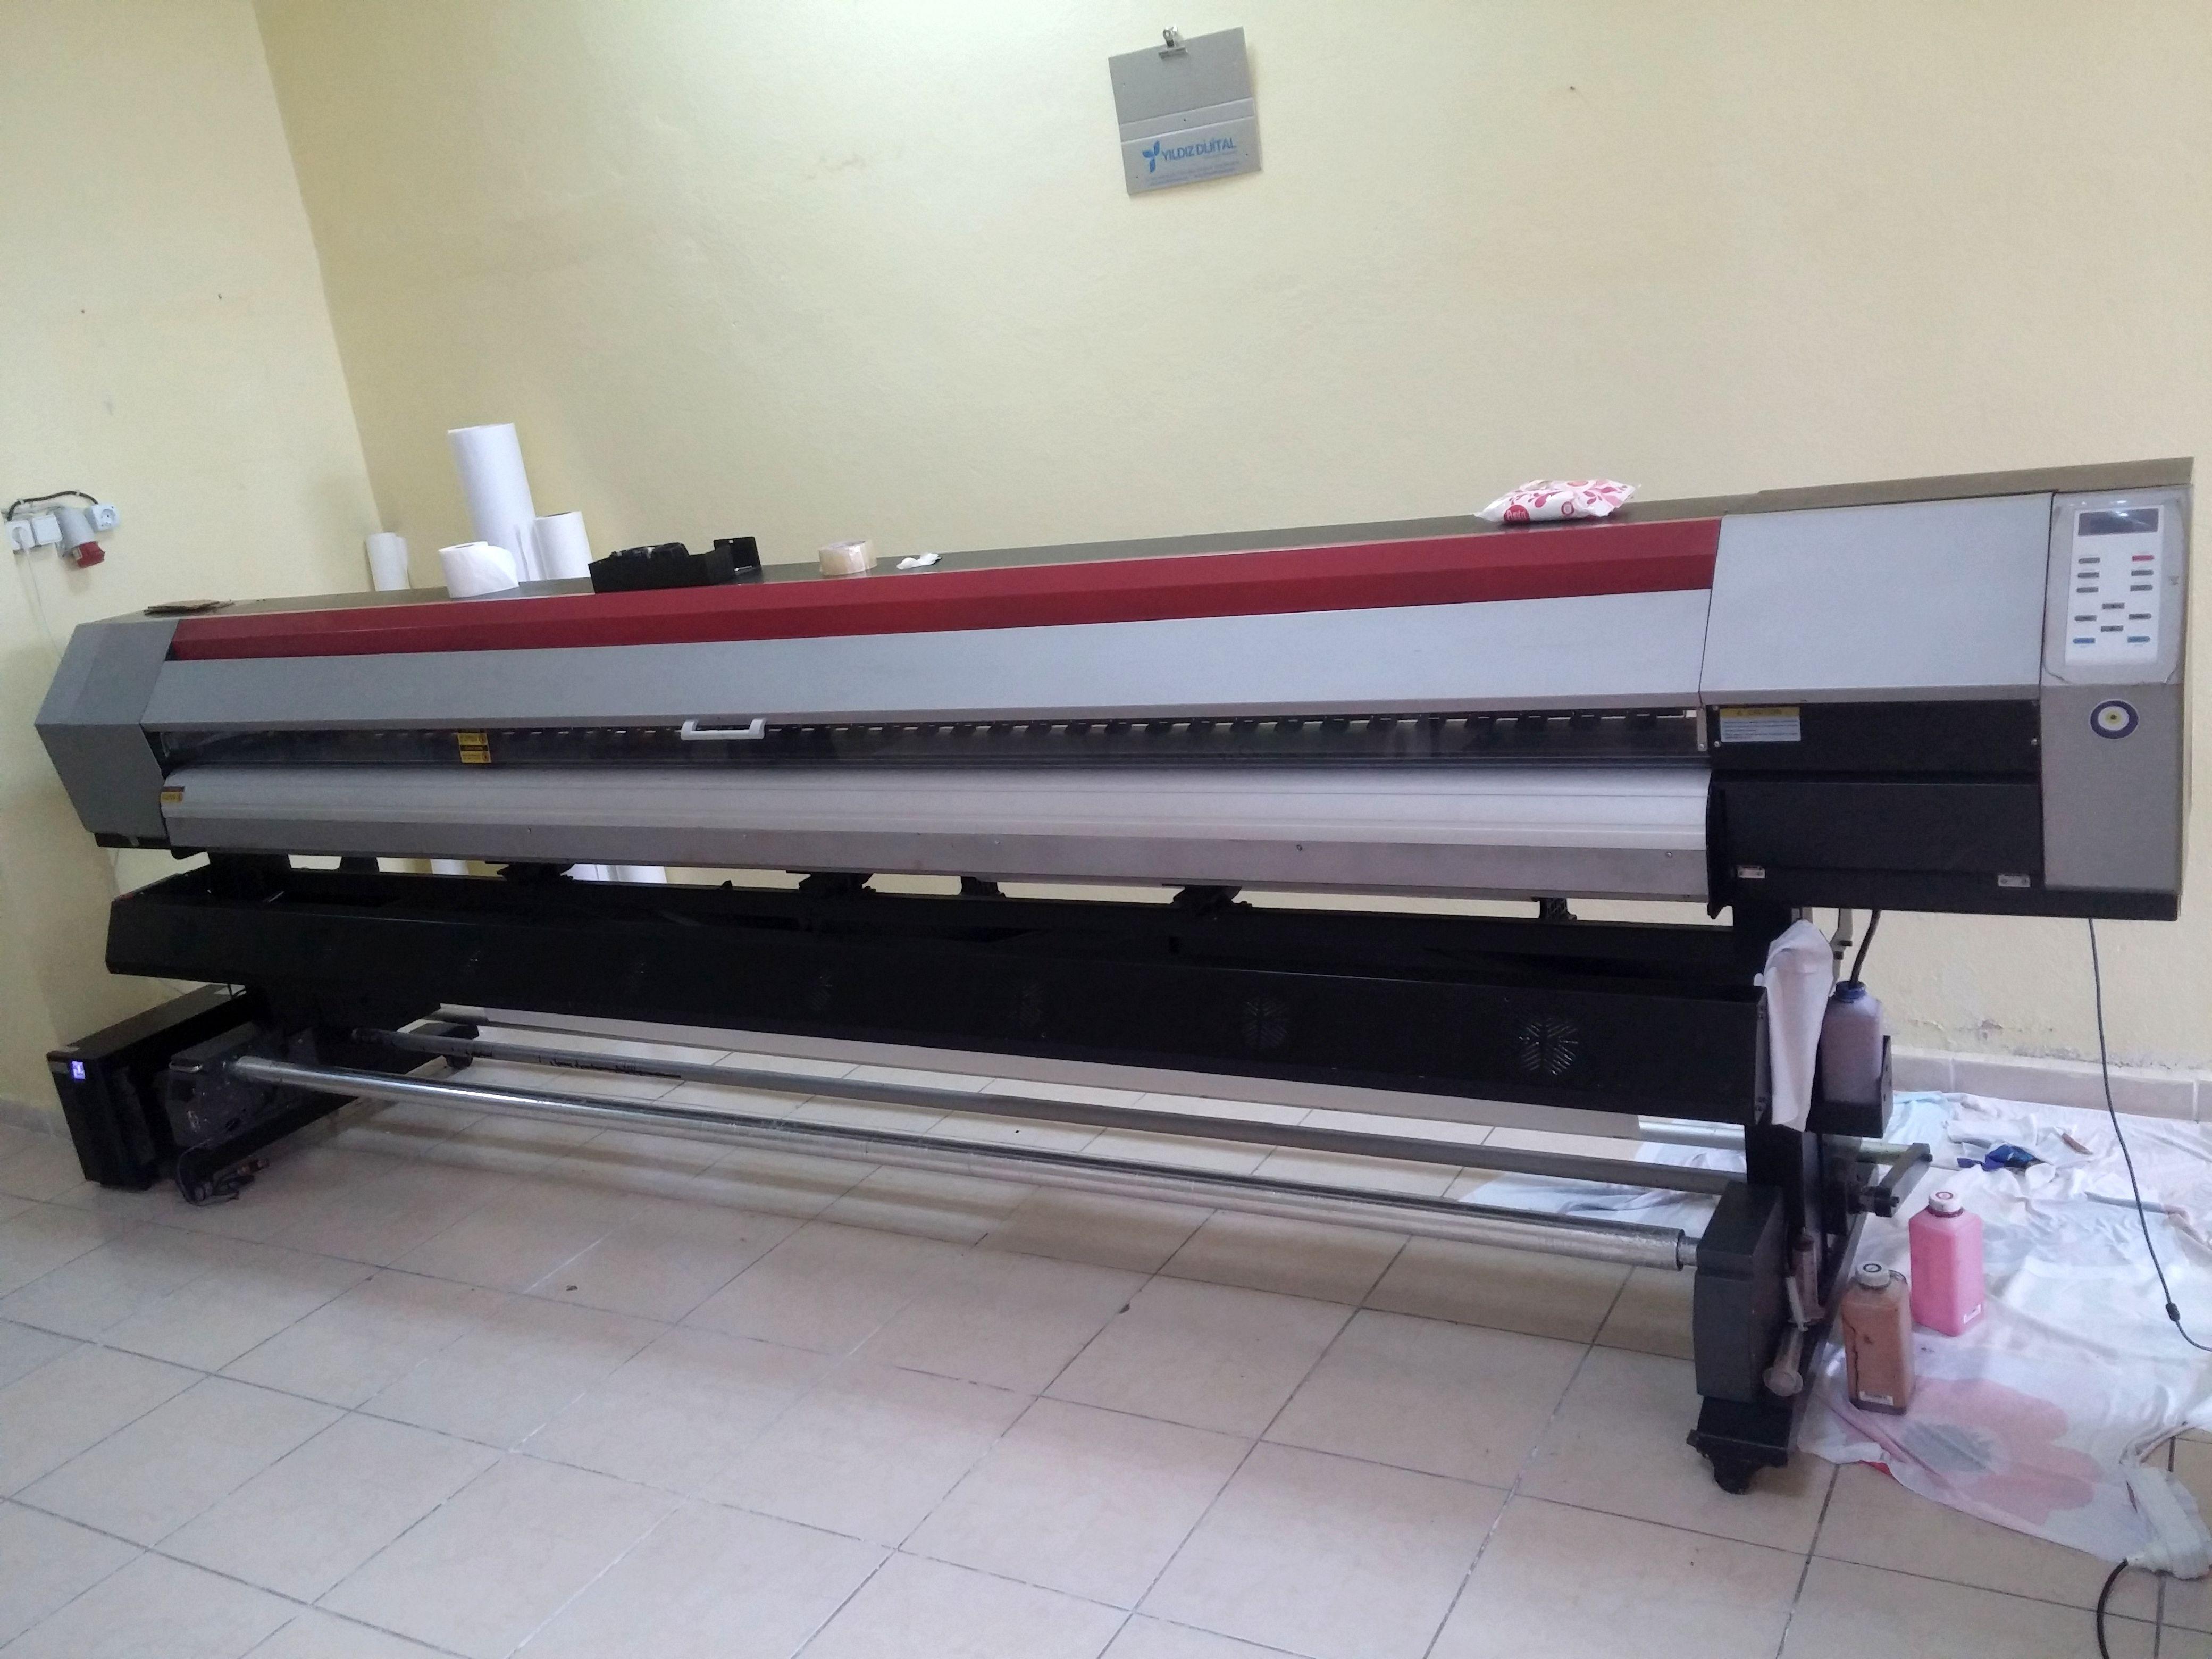 bayrak 40000 tl dijital sublime bayrak baski makinesi 2 el baski makinalari diger dijital baski makinalar dijital makinalari alin satin kiralayin